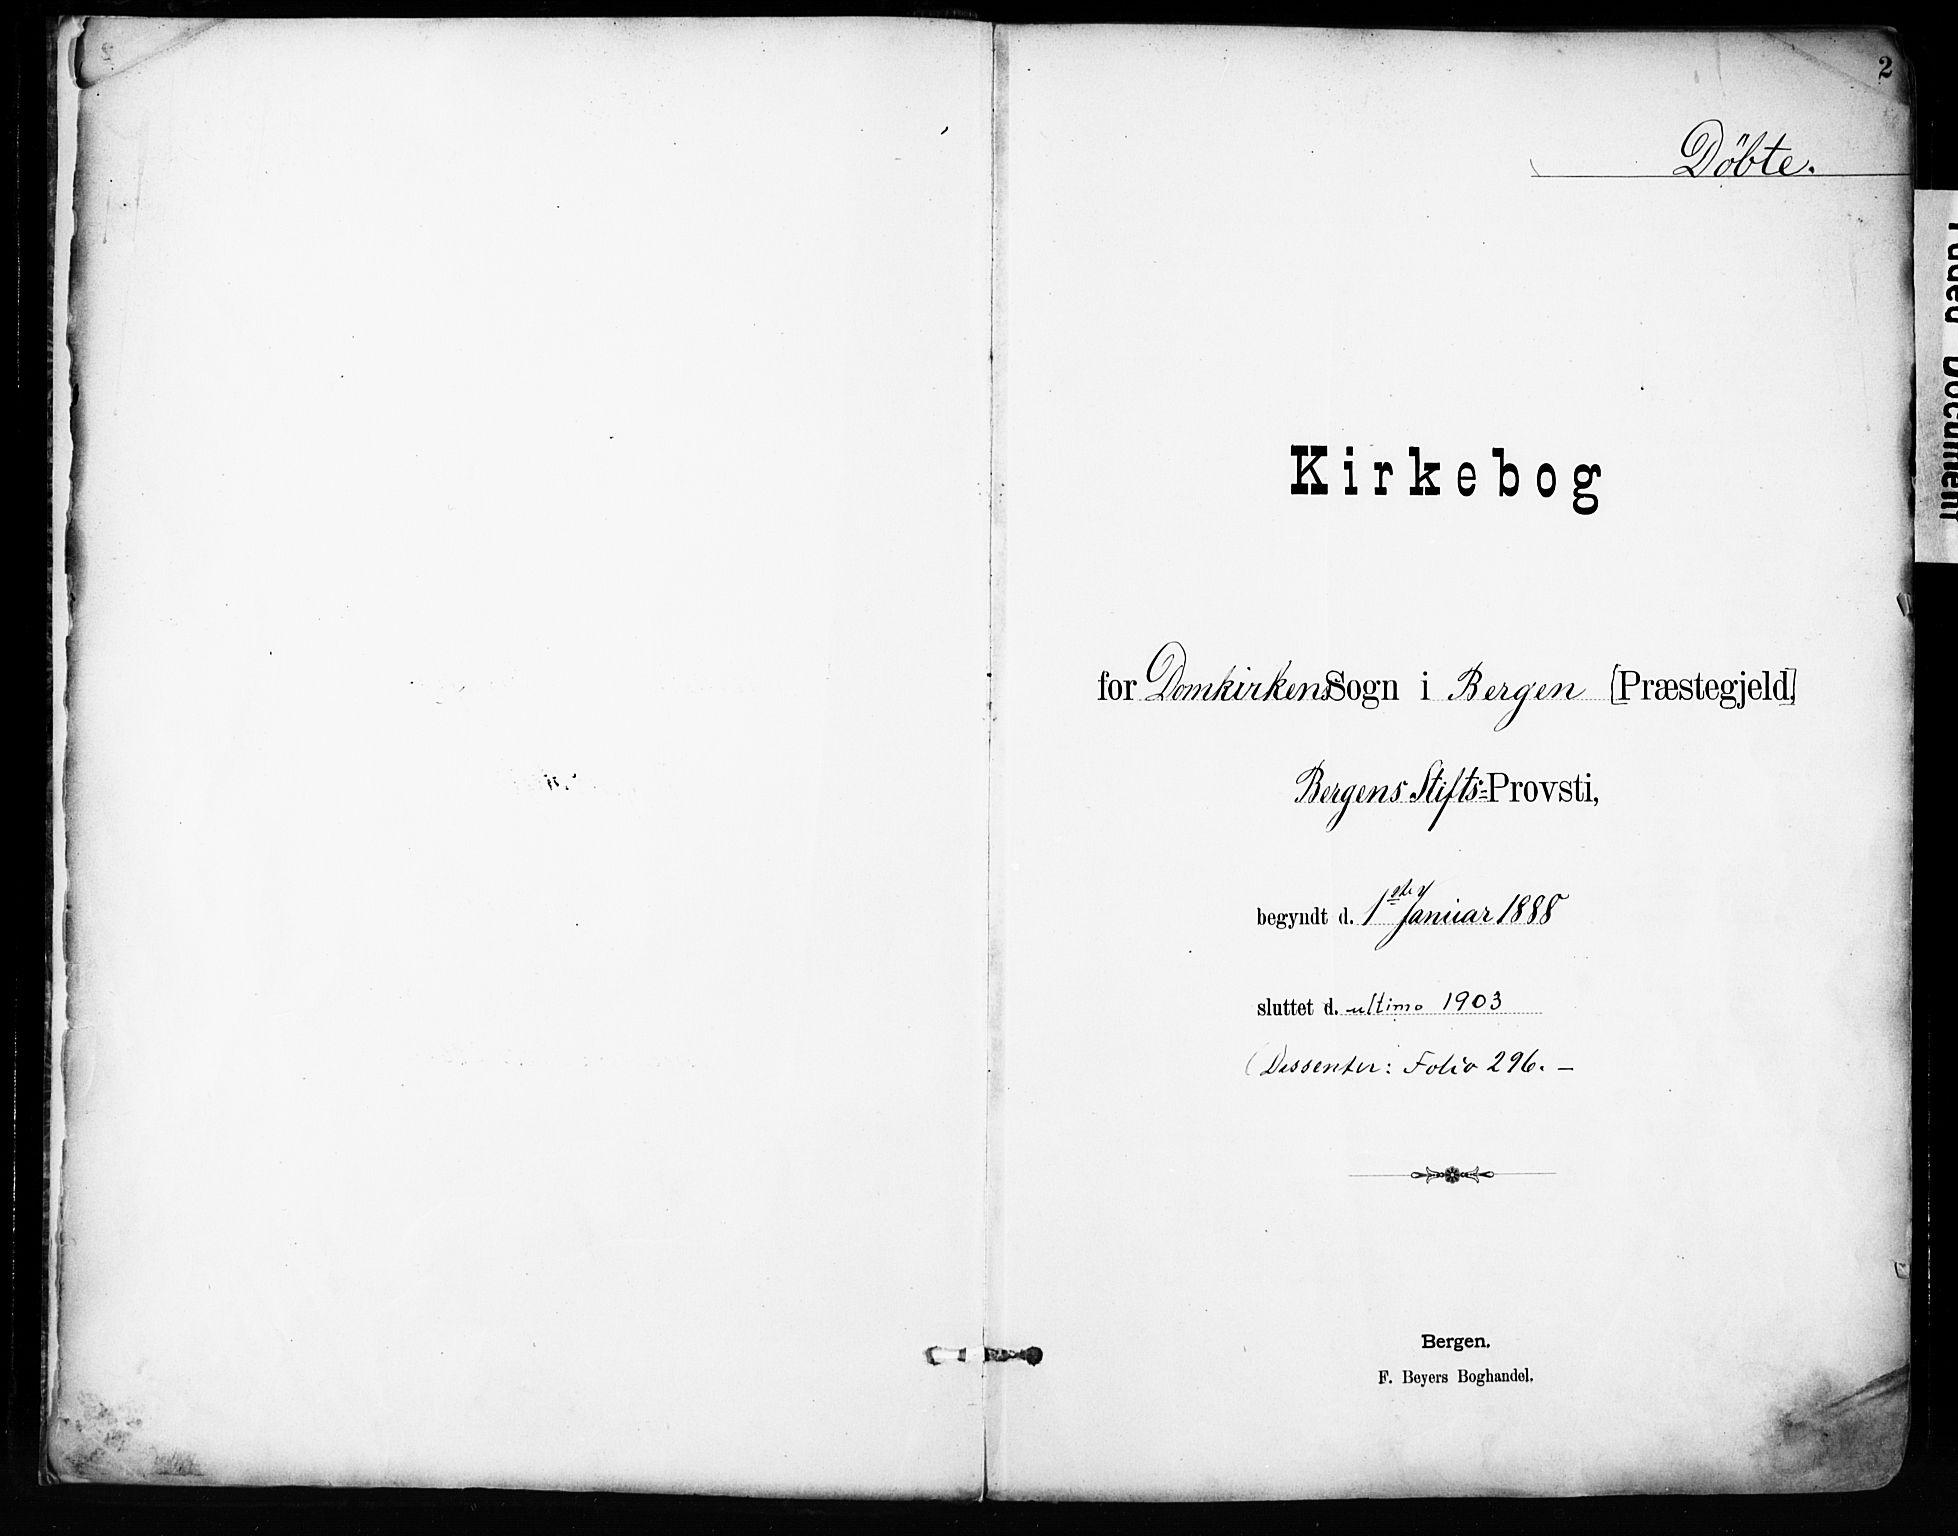 SAB, Domkirken Sokneprestembete, H/Haa/L0024: Ministerialbok nr. B 7, 1888-1903, s. 2